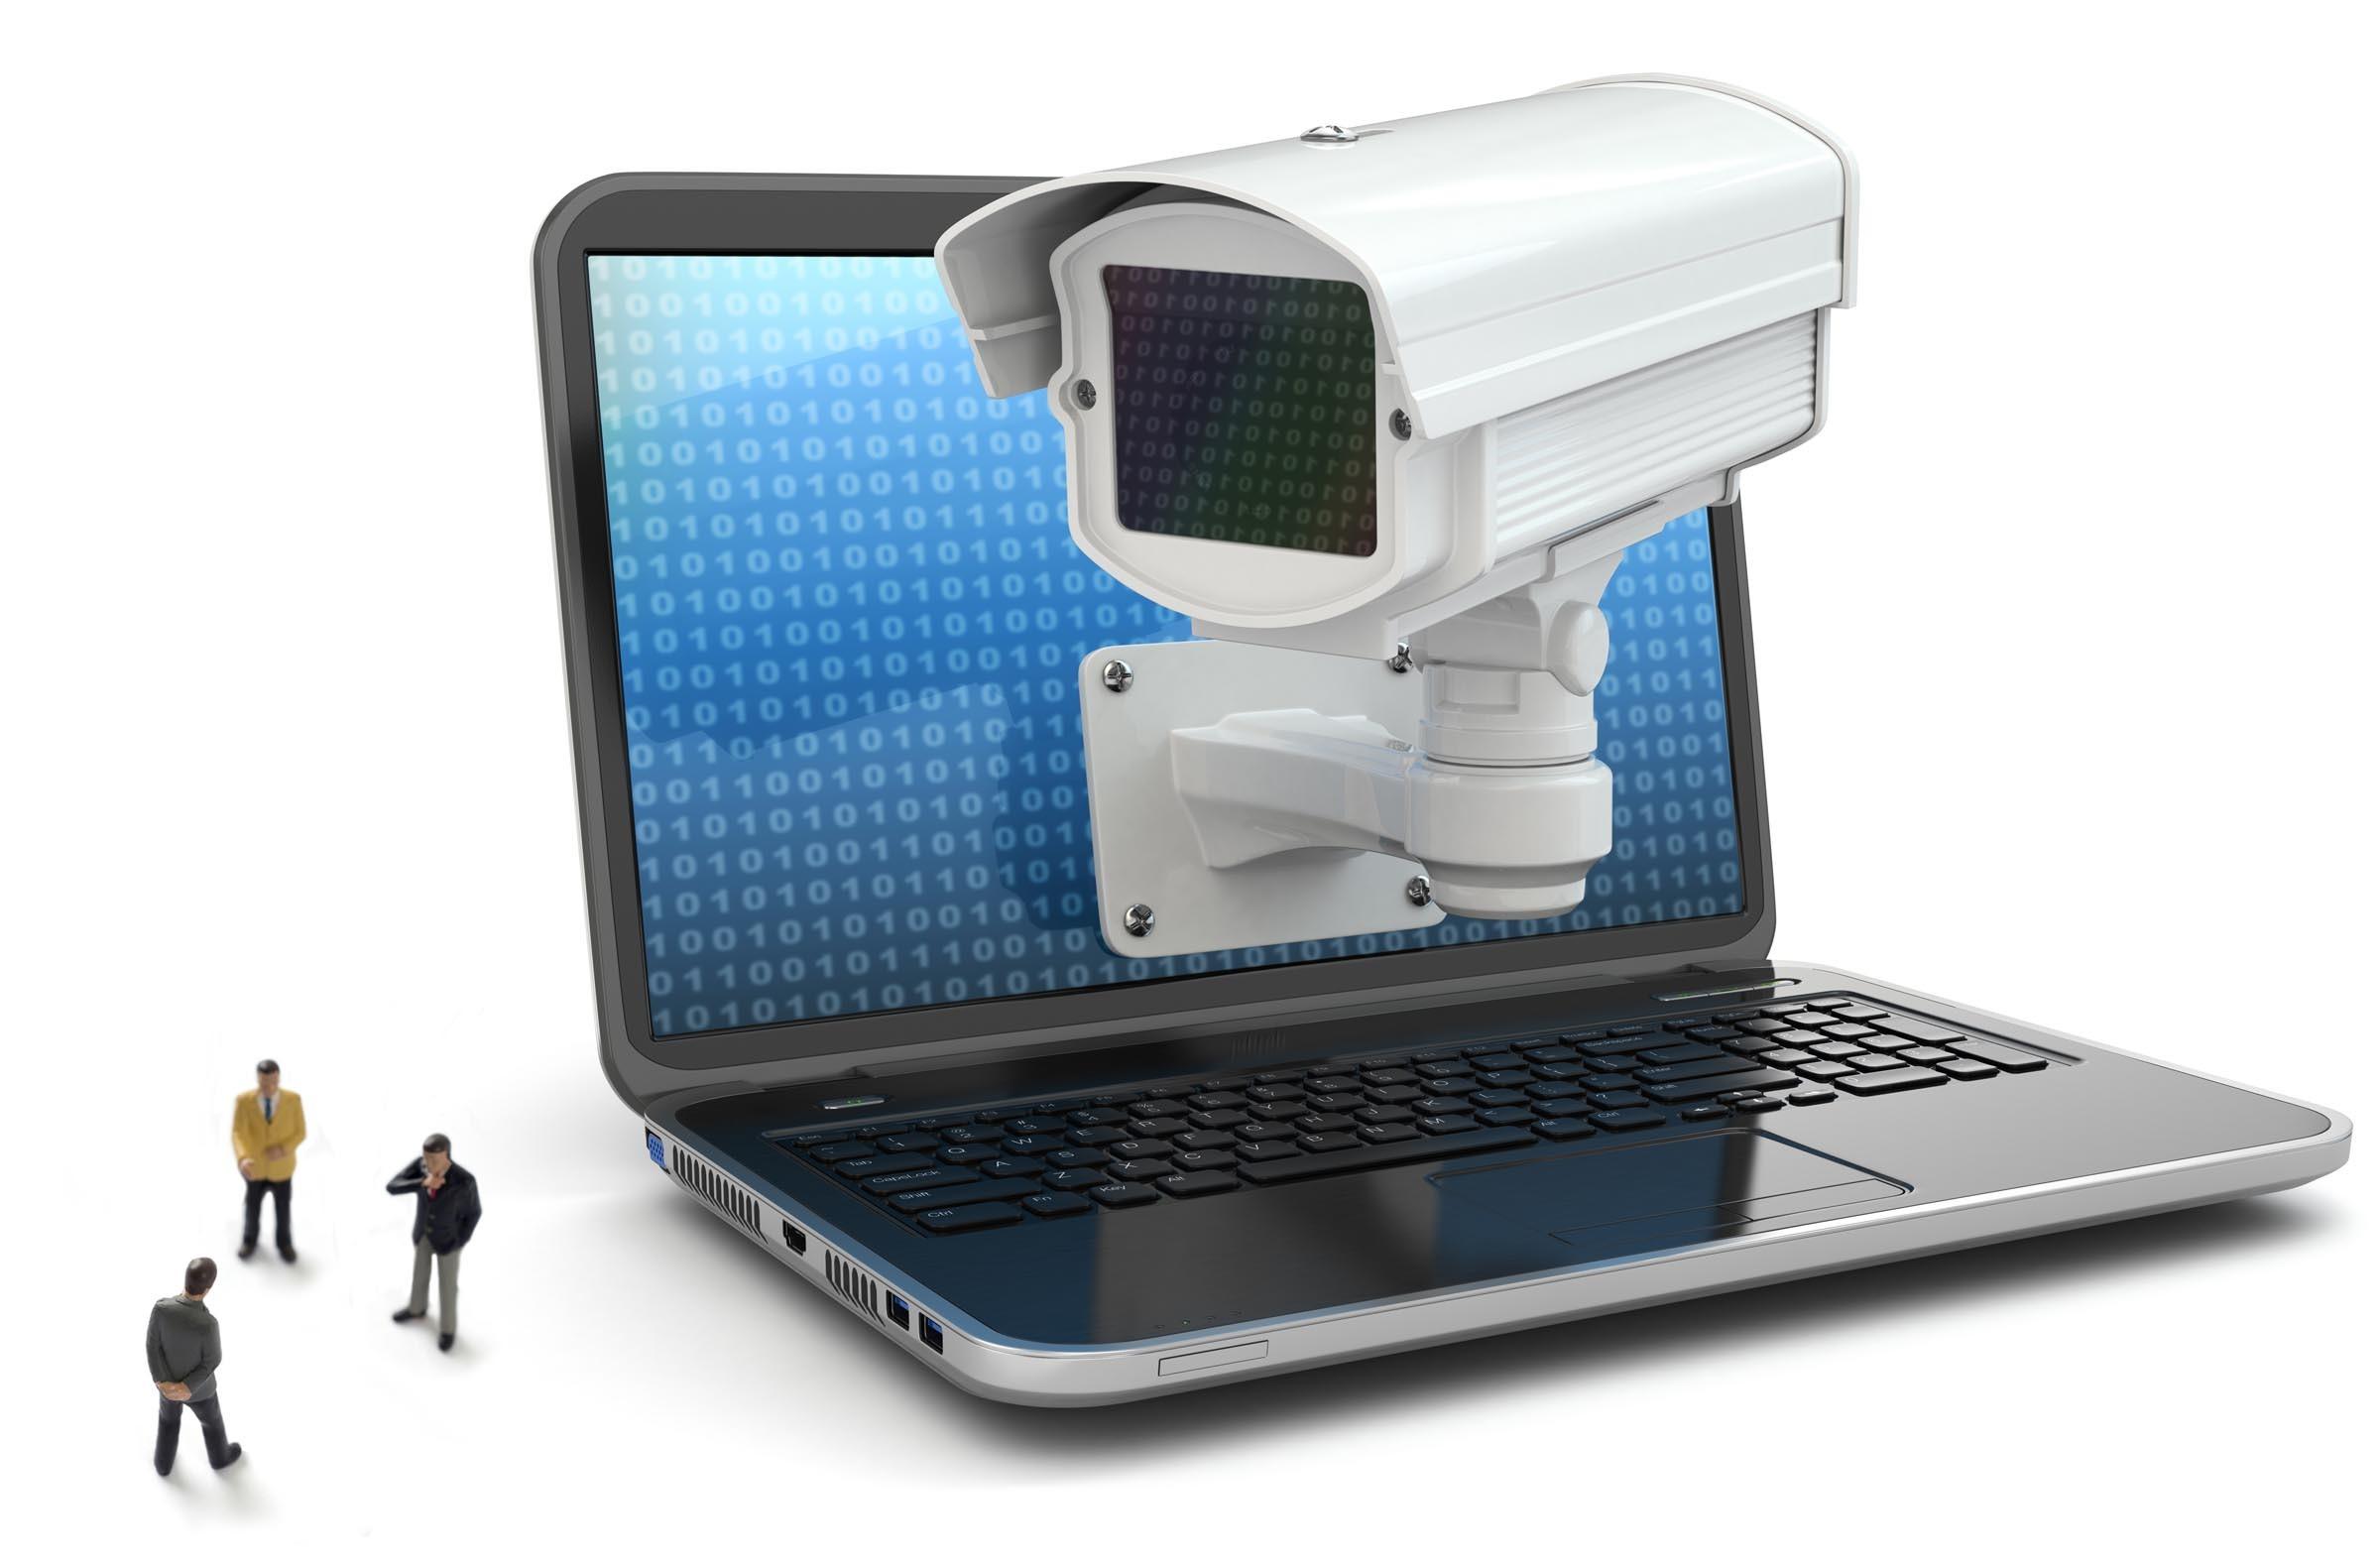 feat46_surveillance_laptop.jpg